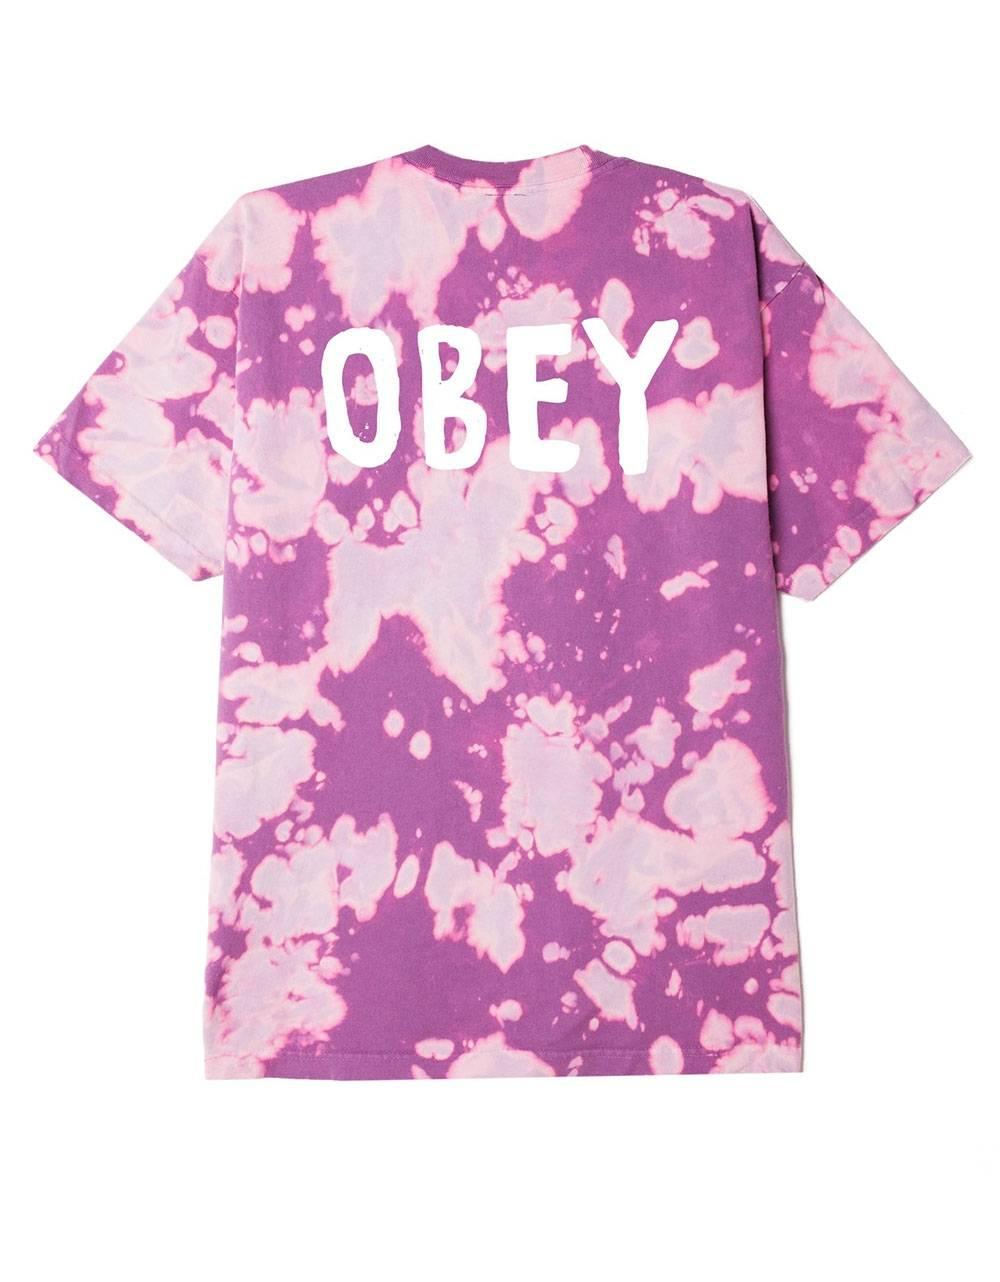 Obey OG heavyweight bleach tie dye t-shirt - purple nitro obey T-shirt 48,36€